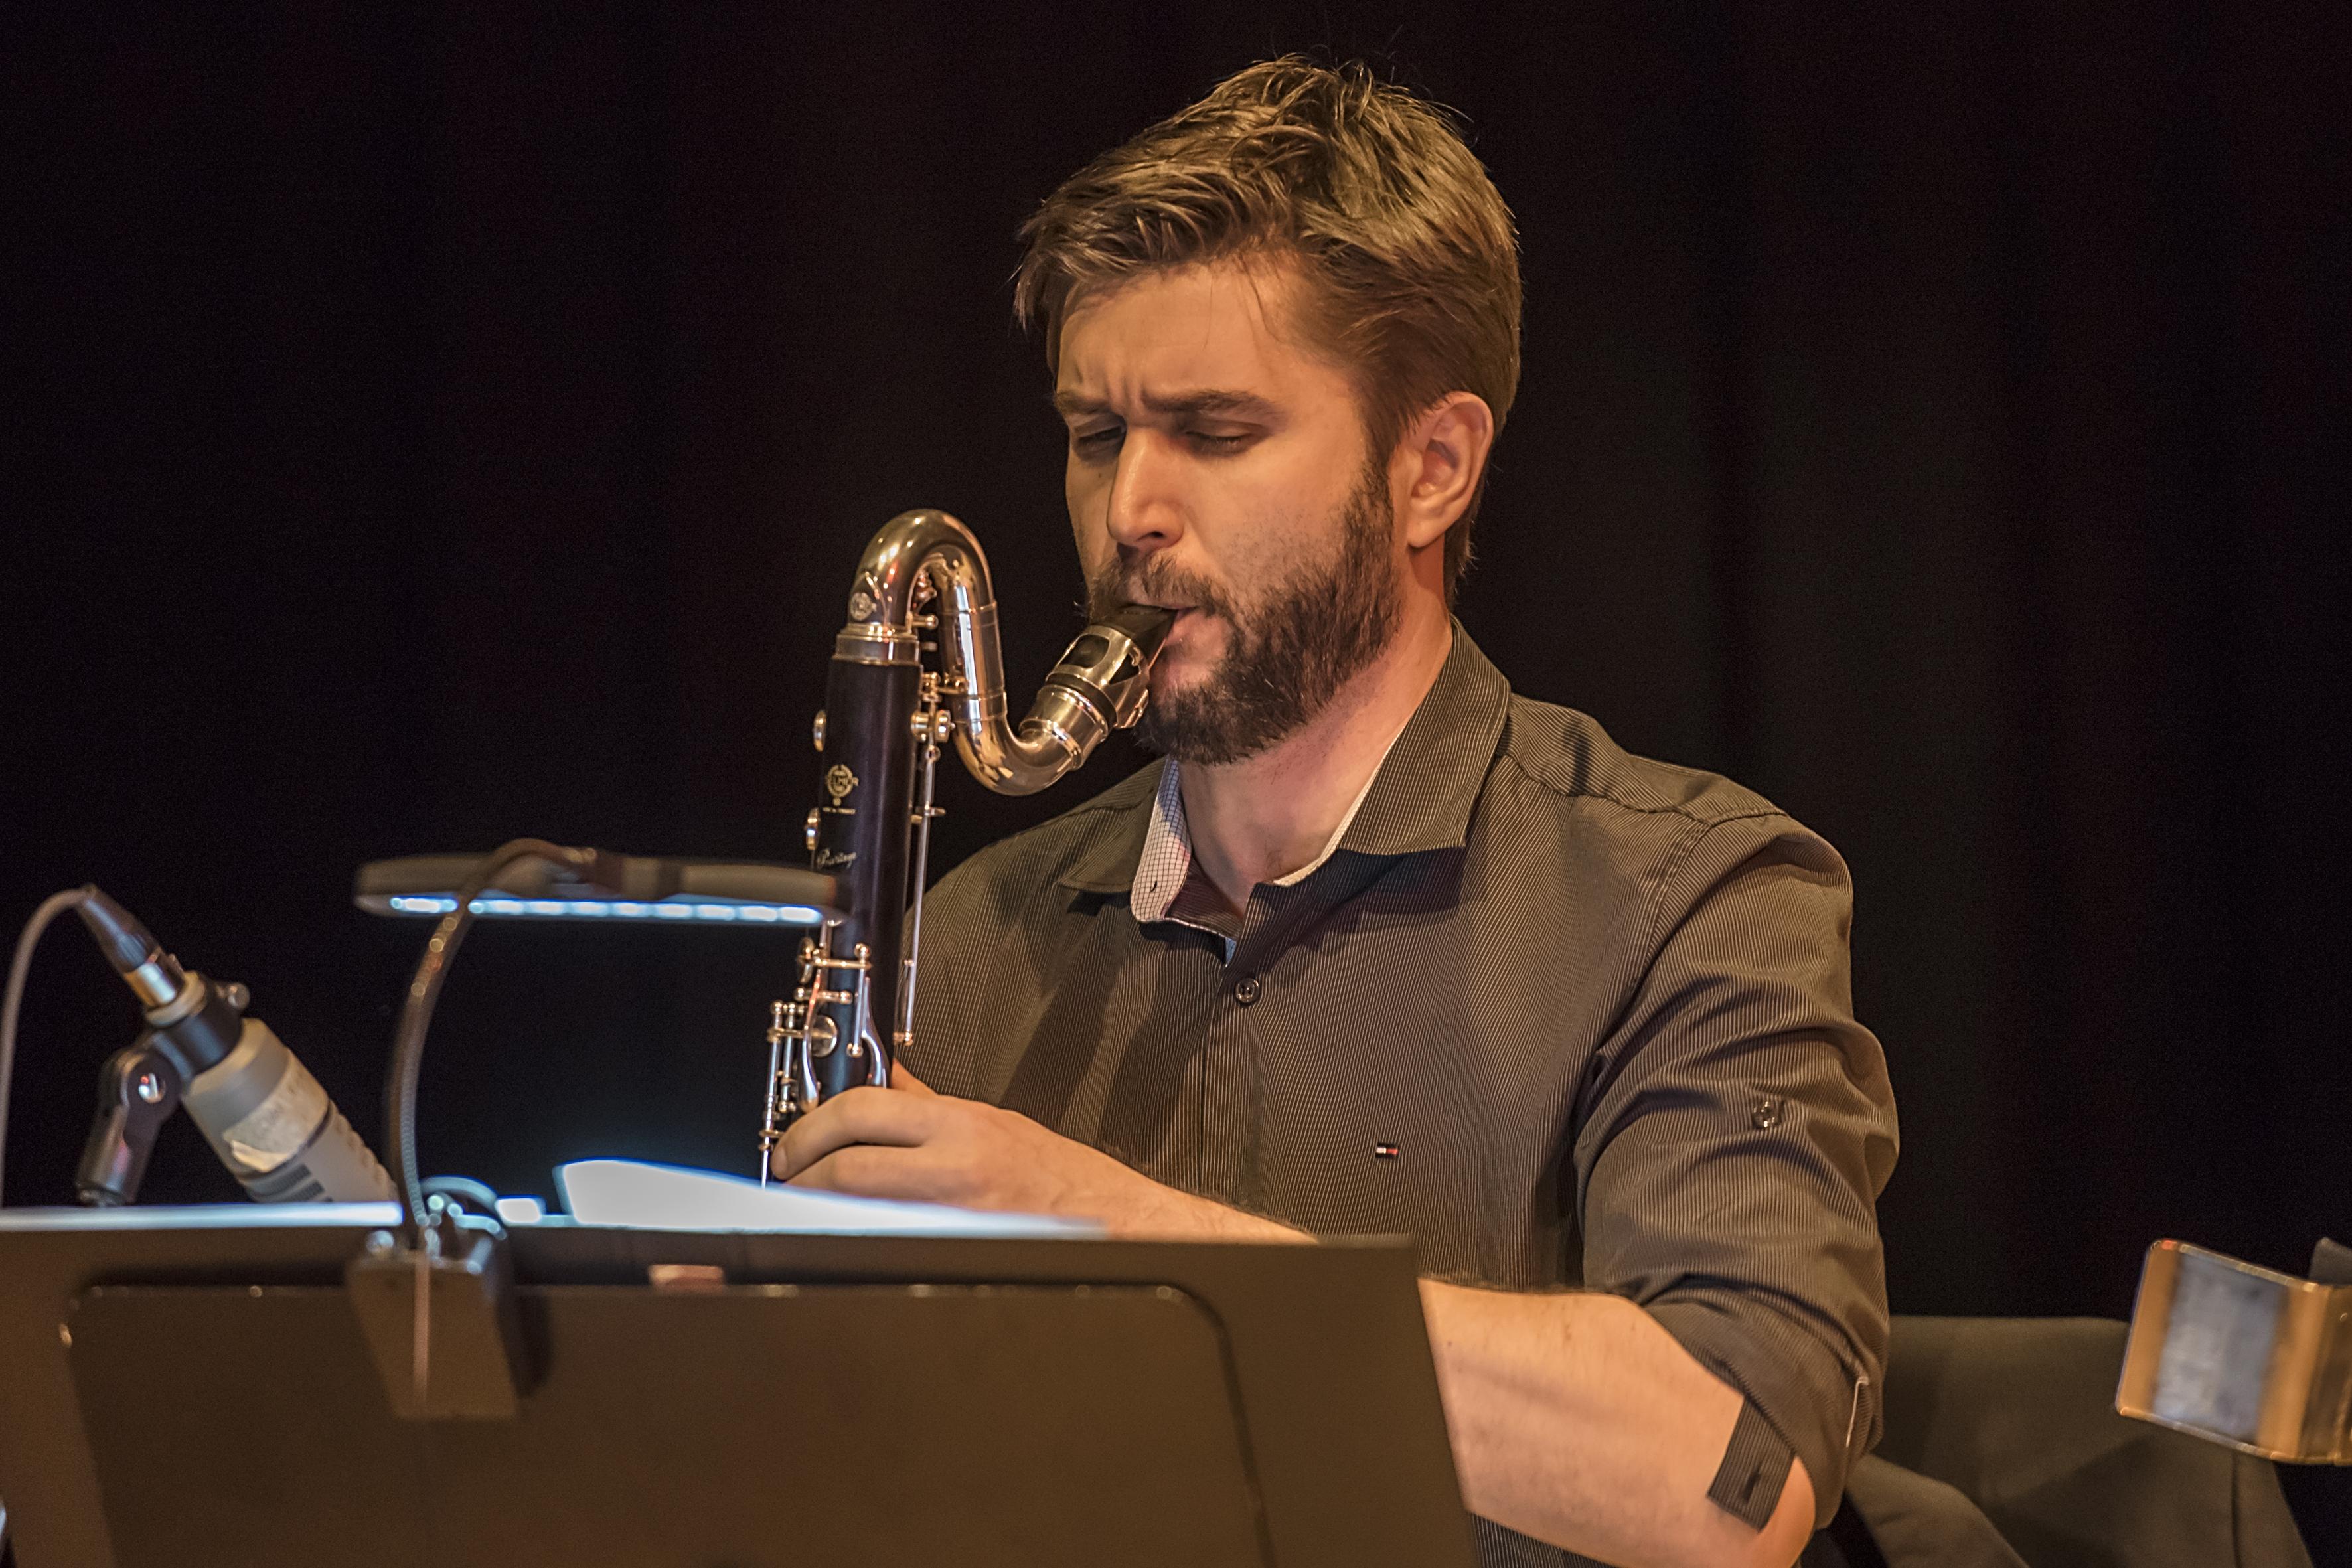 Jan Balaz